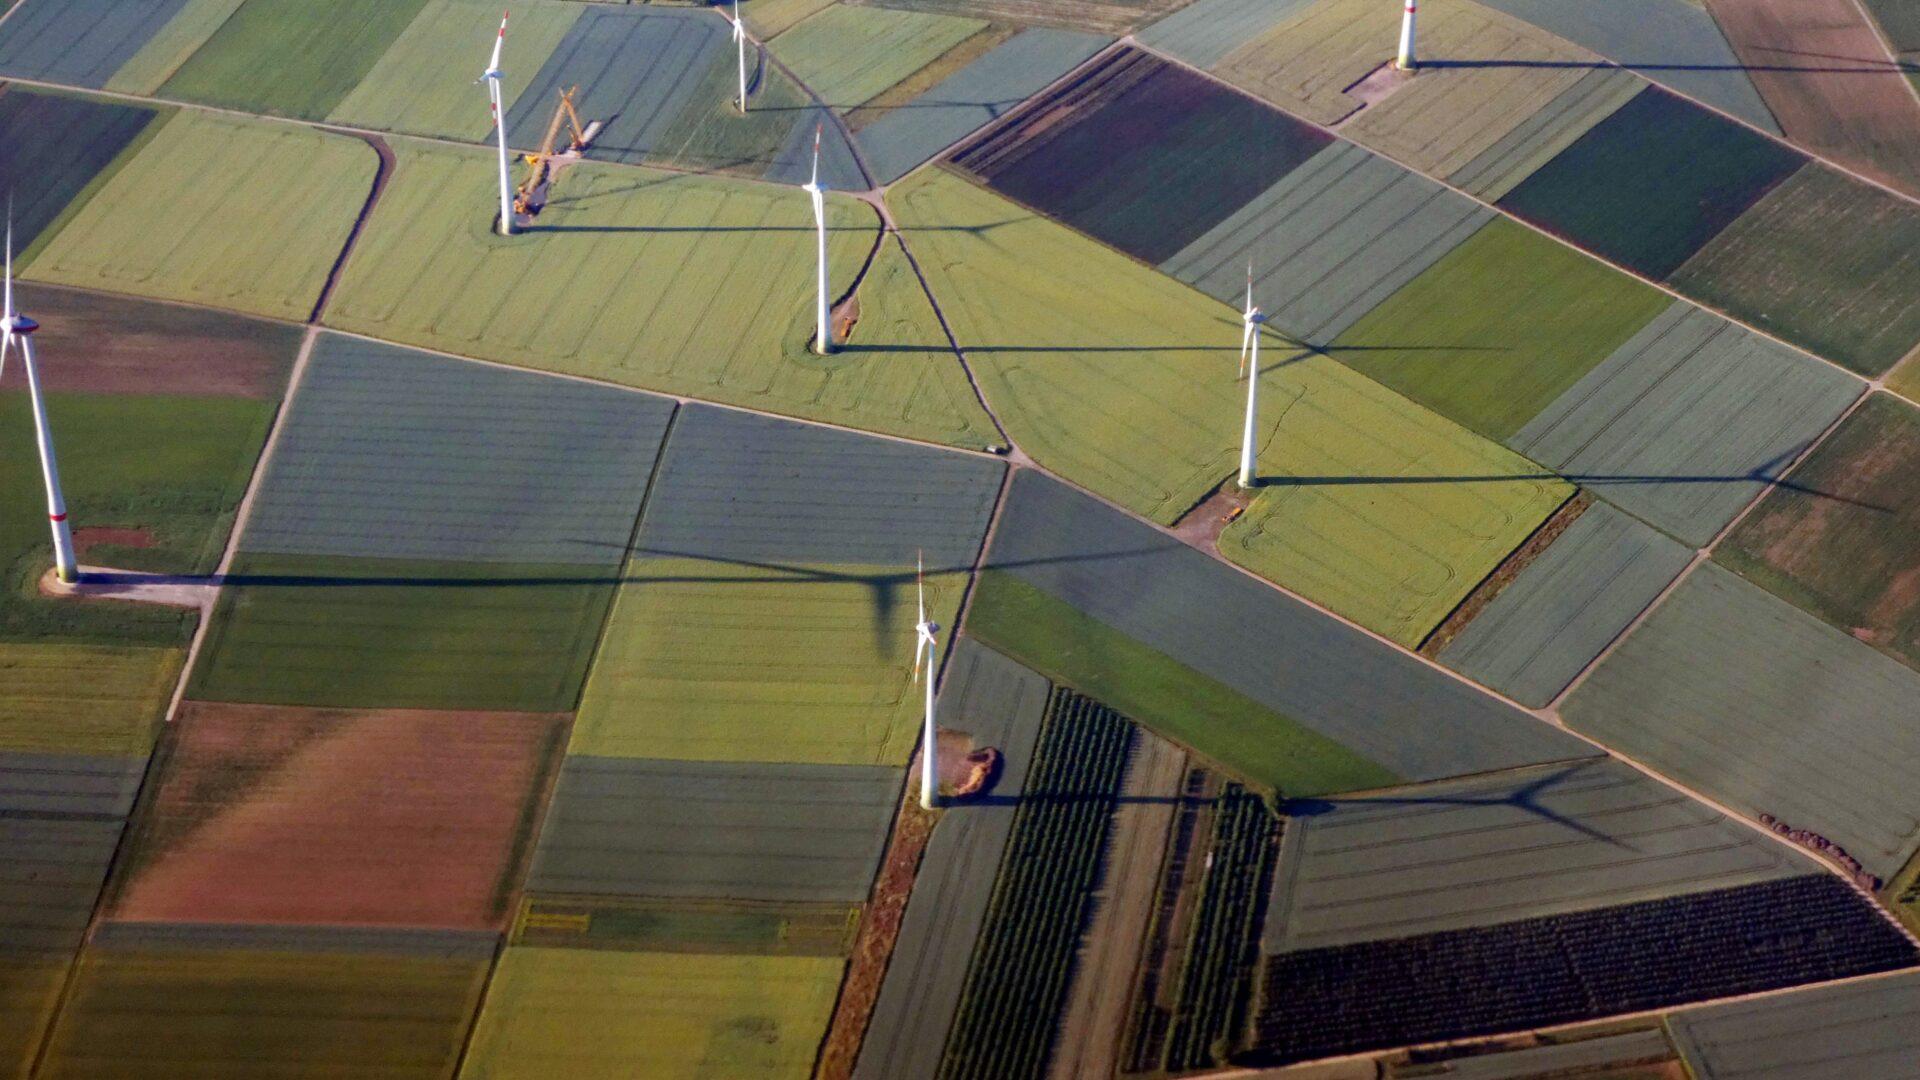 Webber Research: Renewables Weekly – 05.18.21